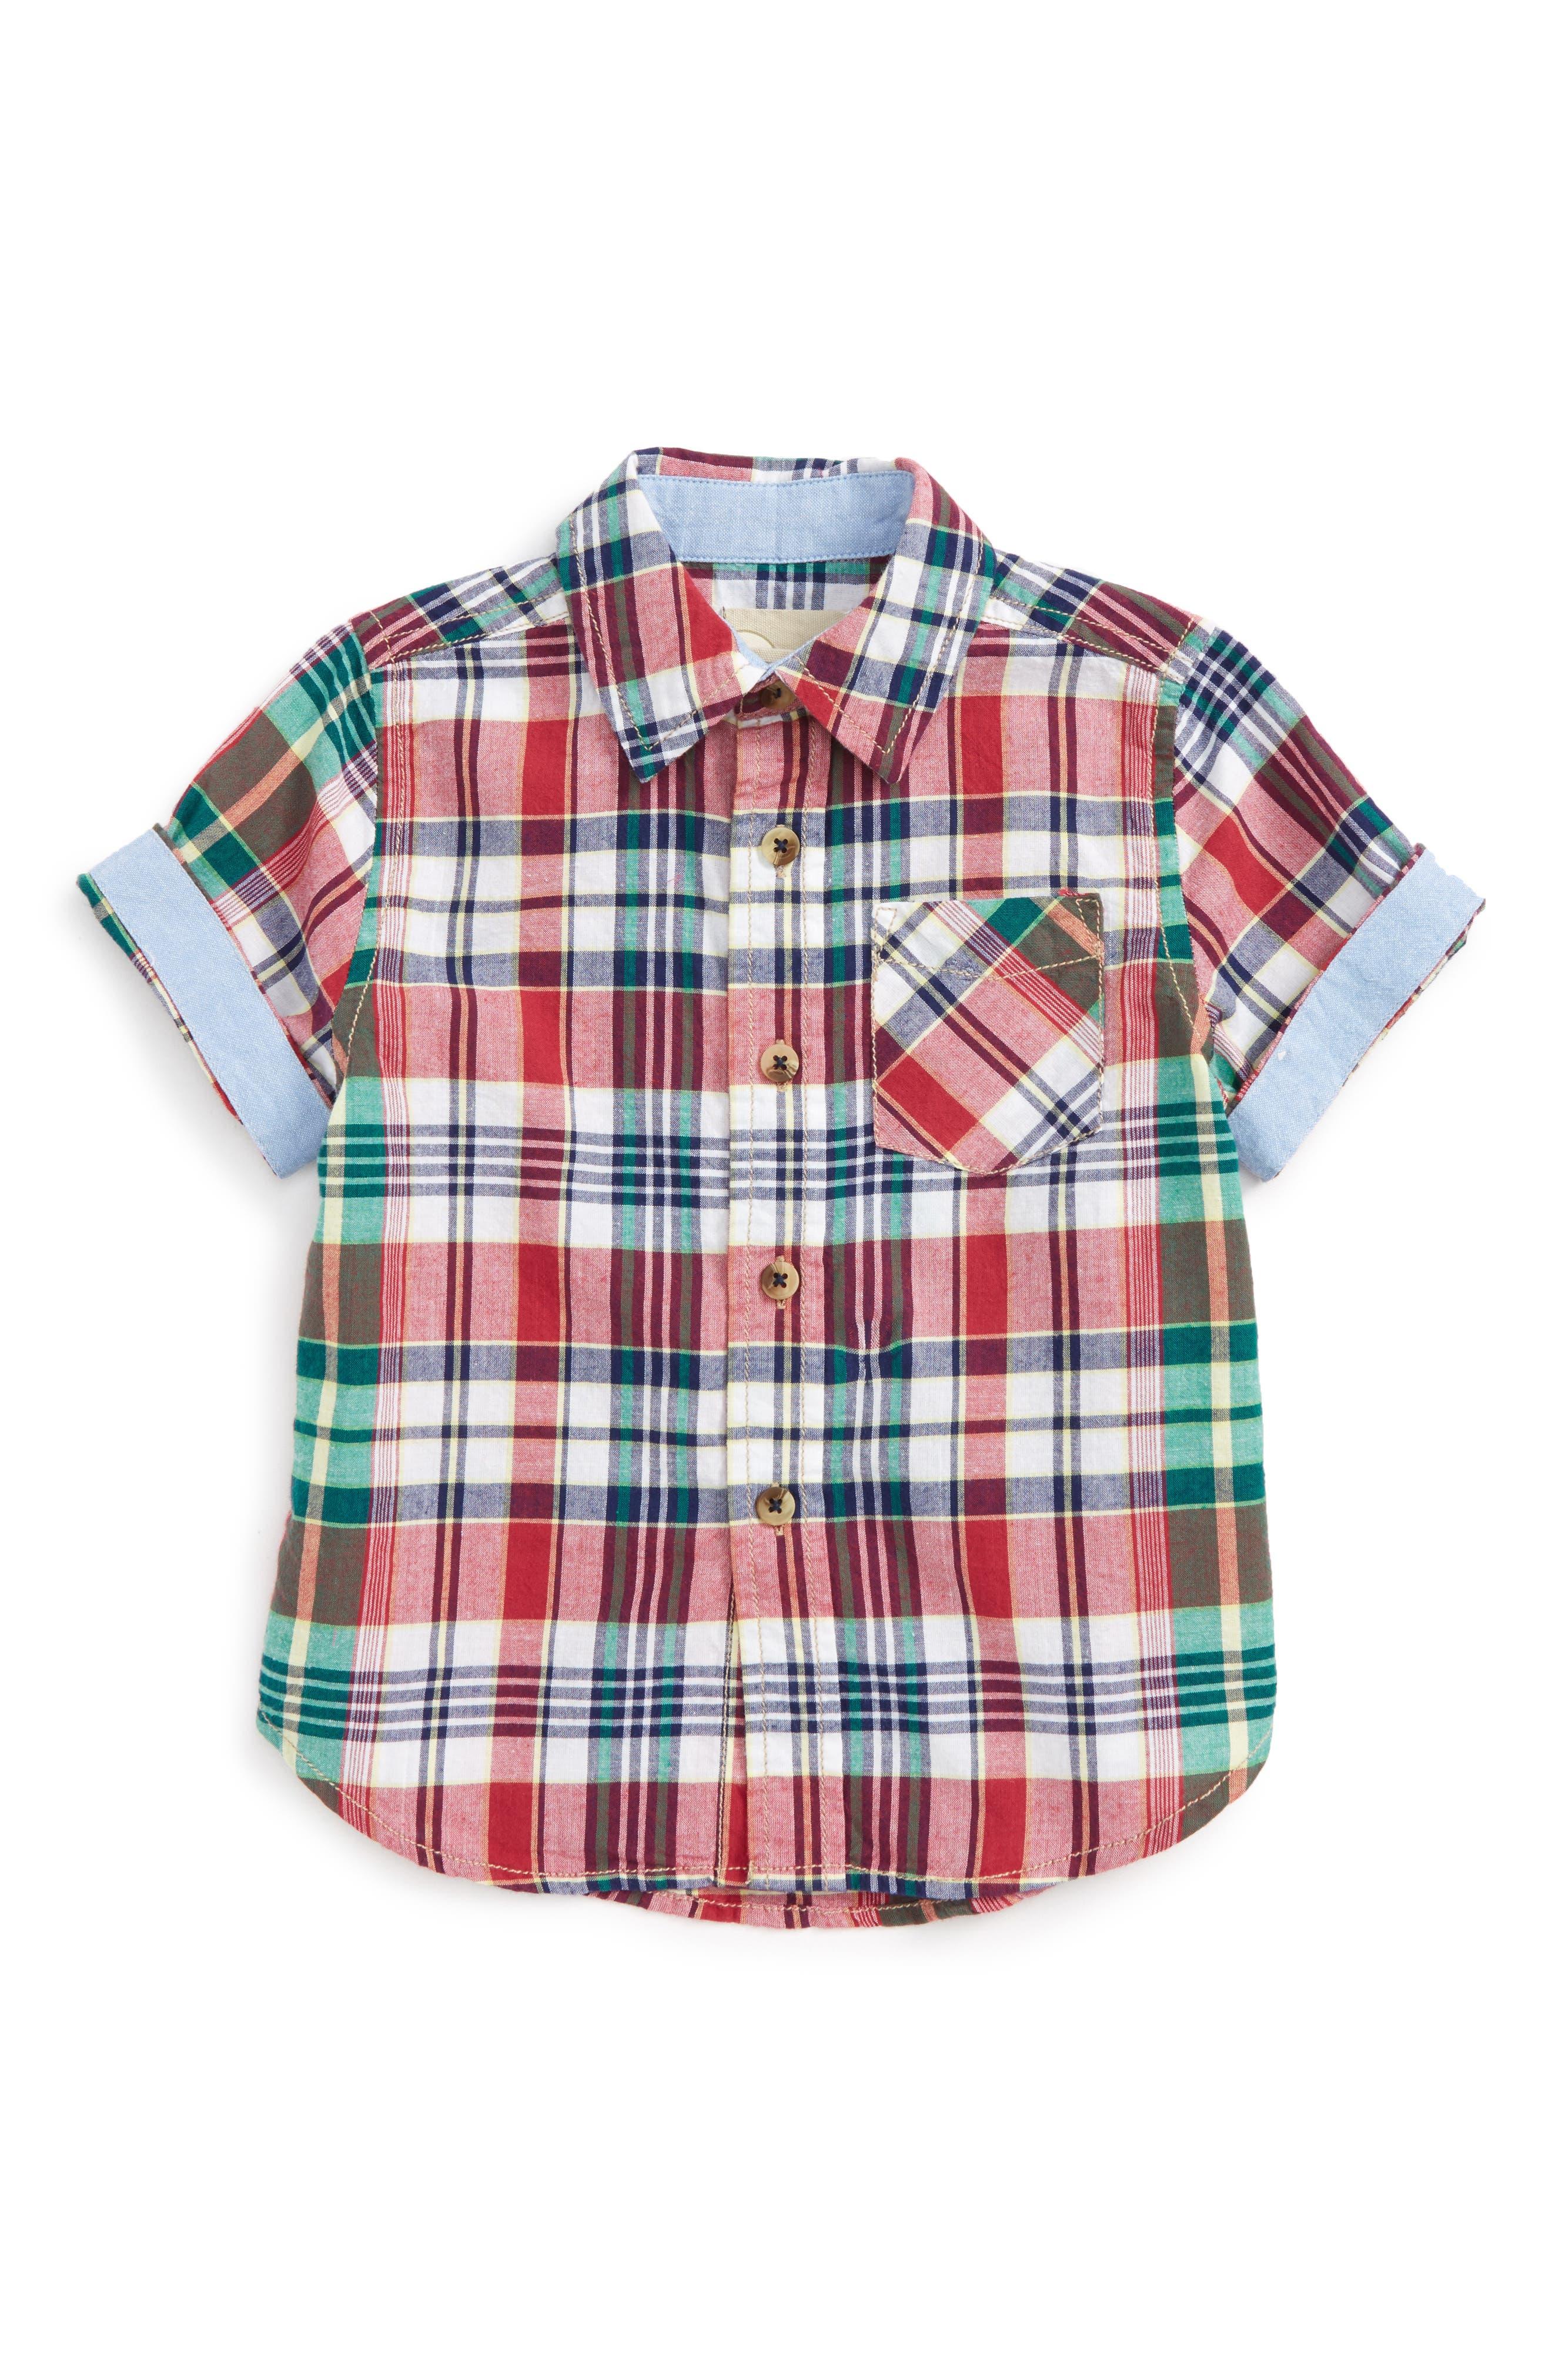 Main Image - Peek Plaid Shirt (Toddler Boys, Little Boys & Big Boys)